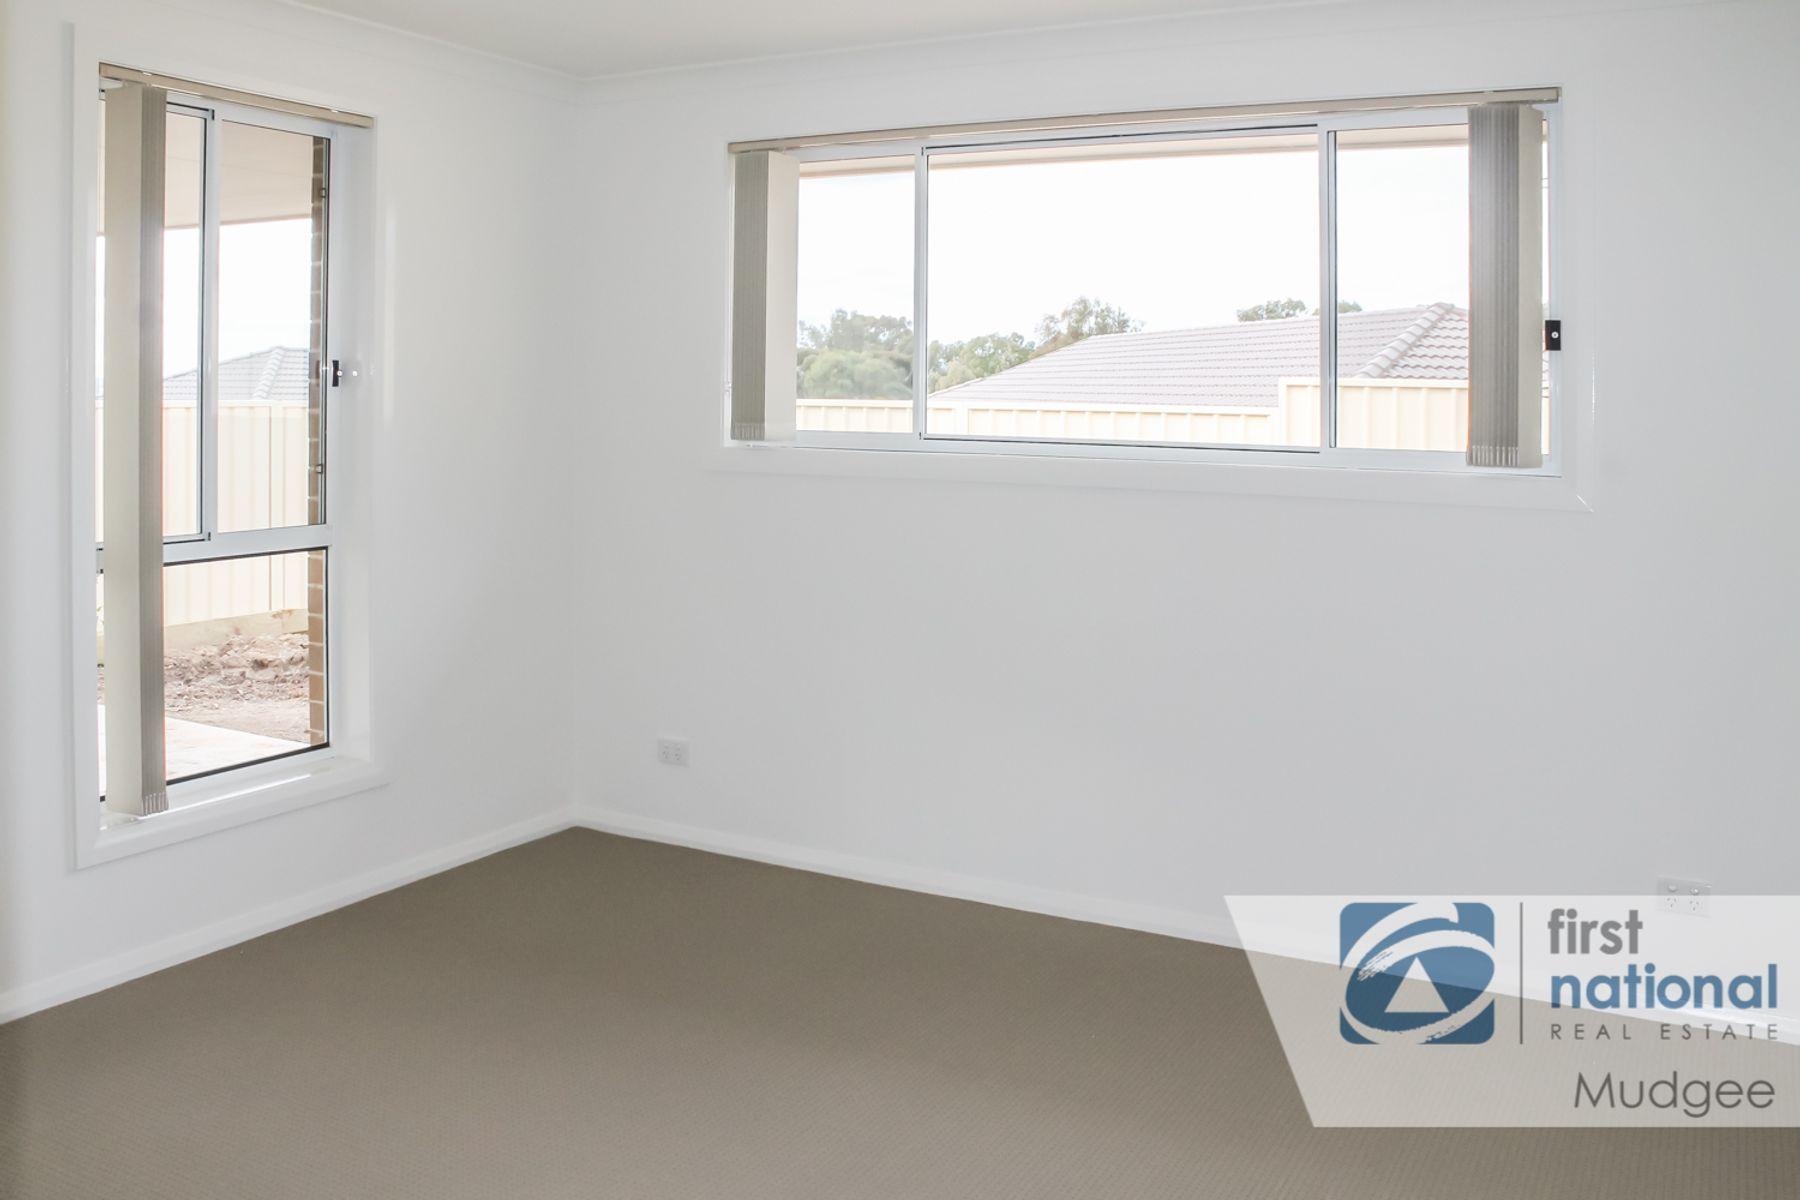 43 Oporto Road, Mudgee, NSW 2850